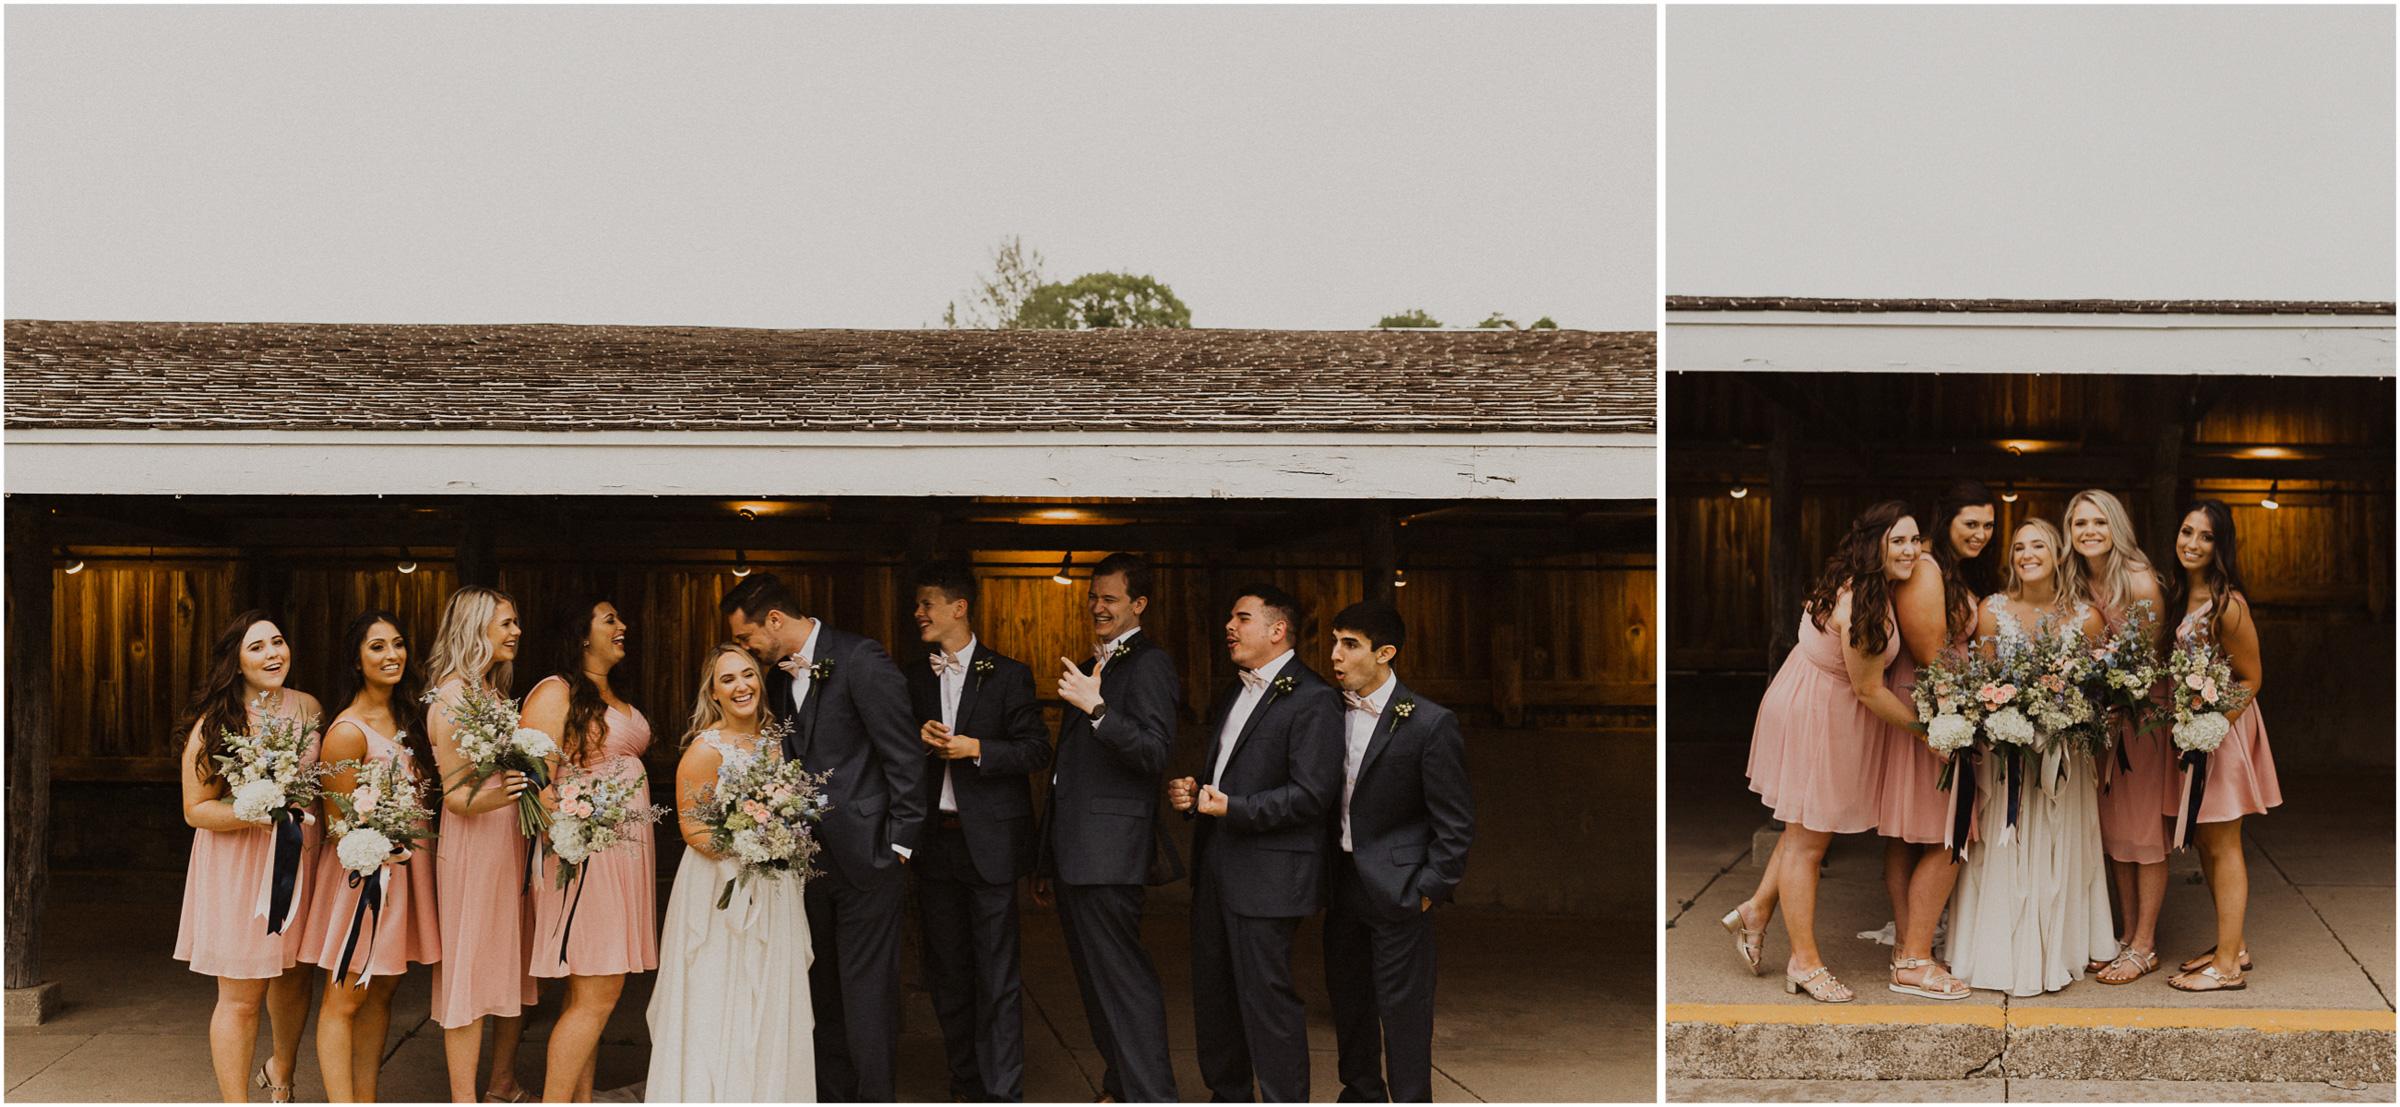 alyssa barletter photography nelson wedding nebraska city lied lodge morton barn spring wedding photographer-20.jpg